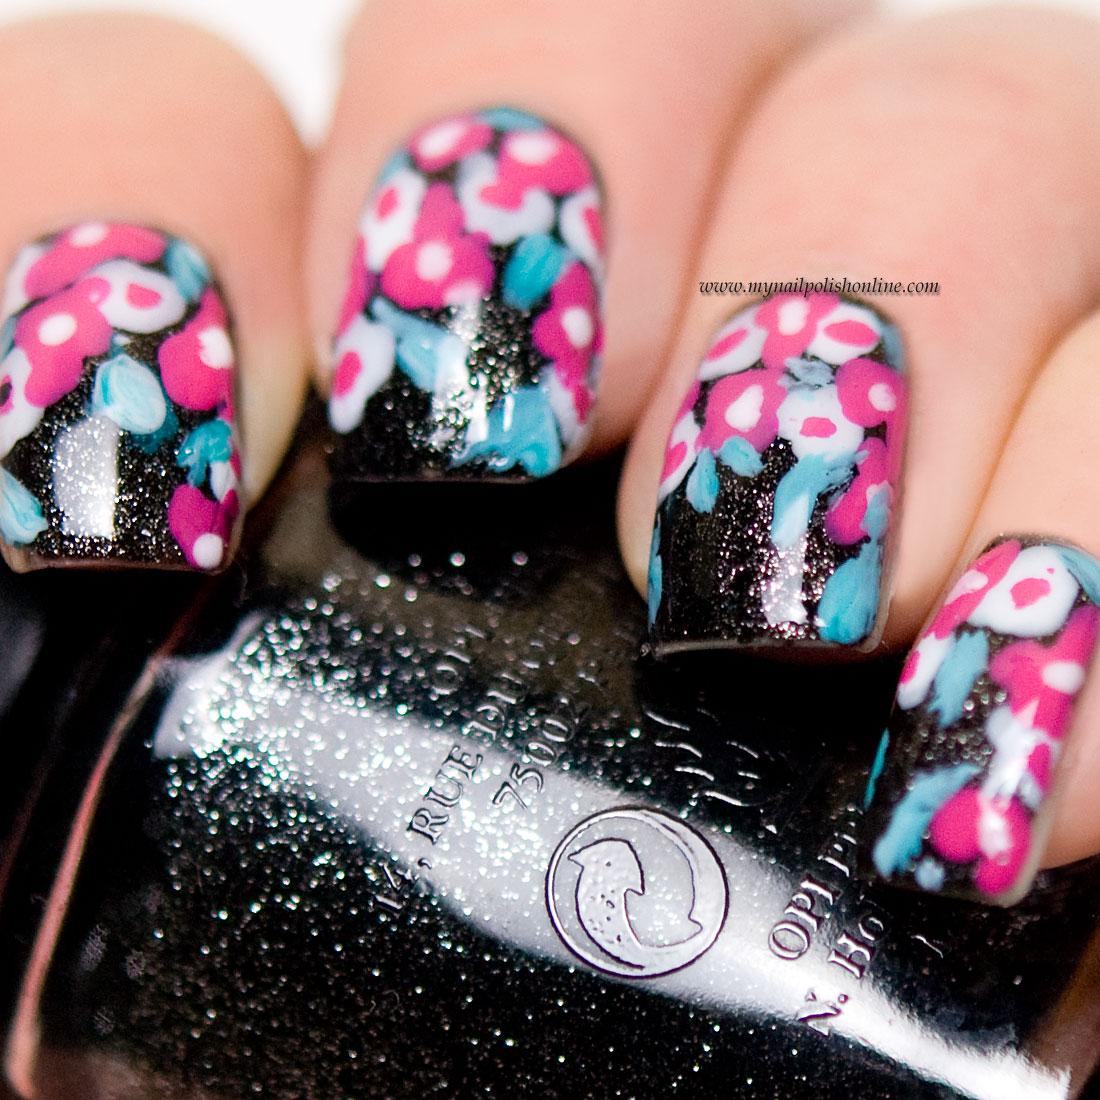 Nail art - flowers on black